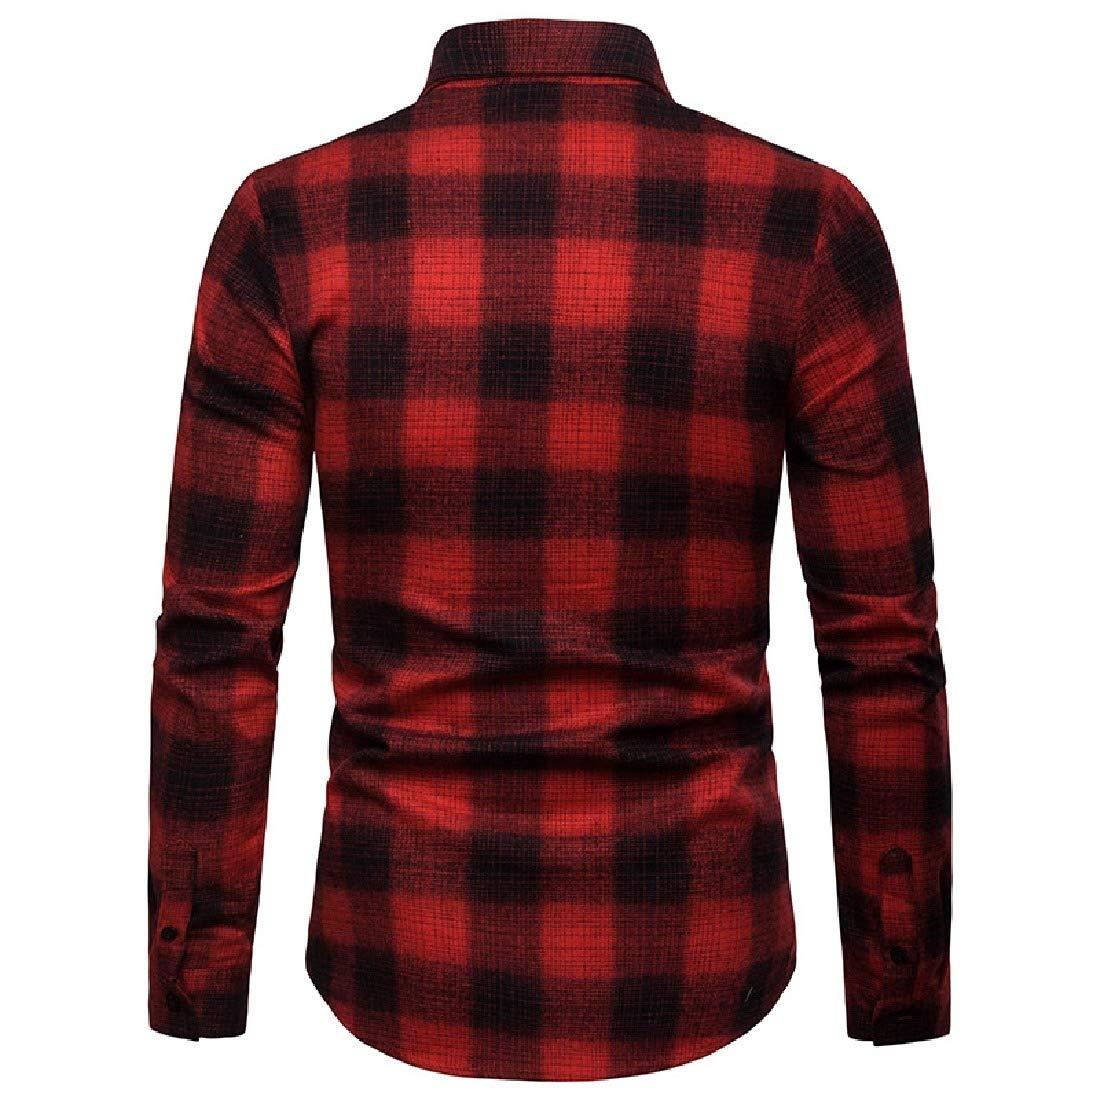 Zimaes-Men Turn Down Collar Plaid Long Sleeve Casual Standard-fit Western Shirt